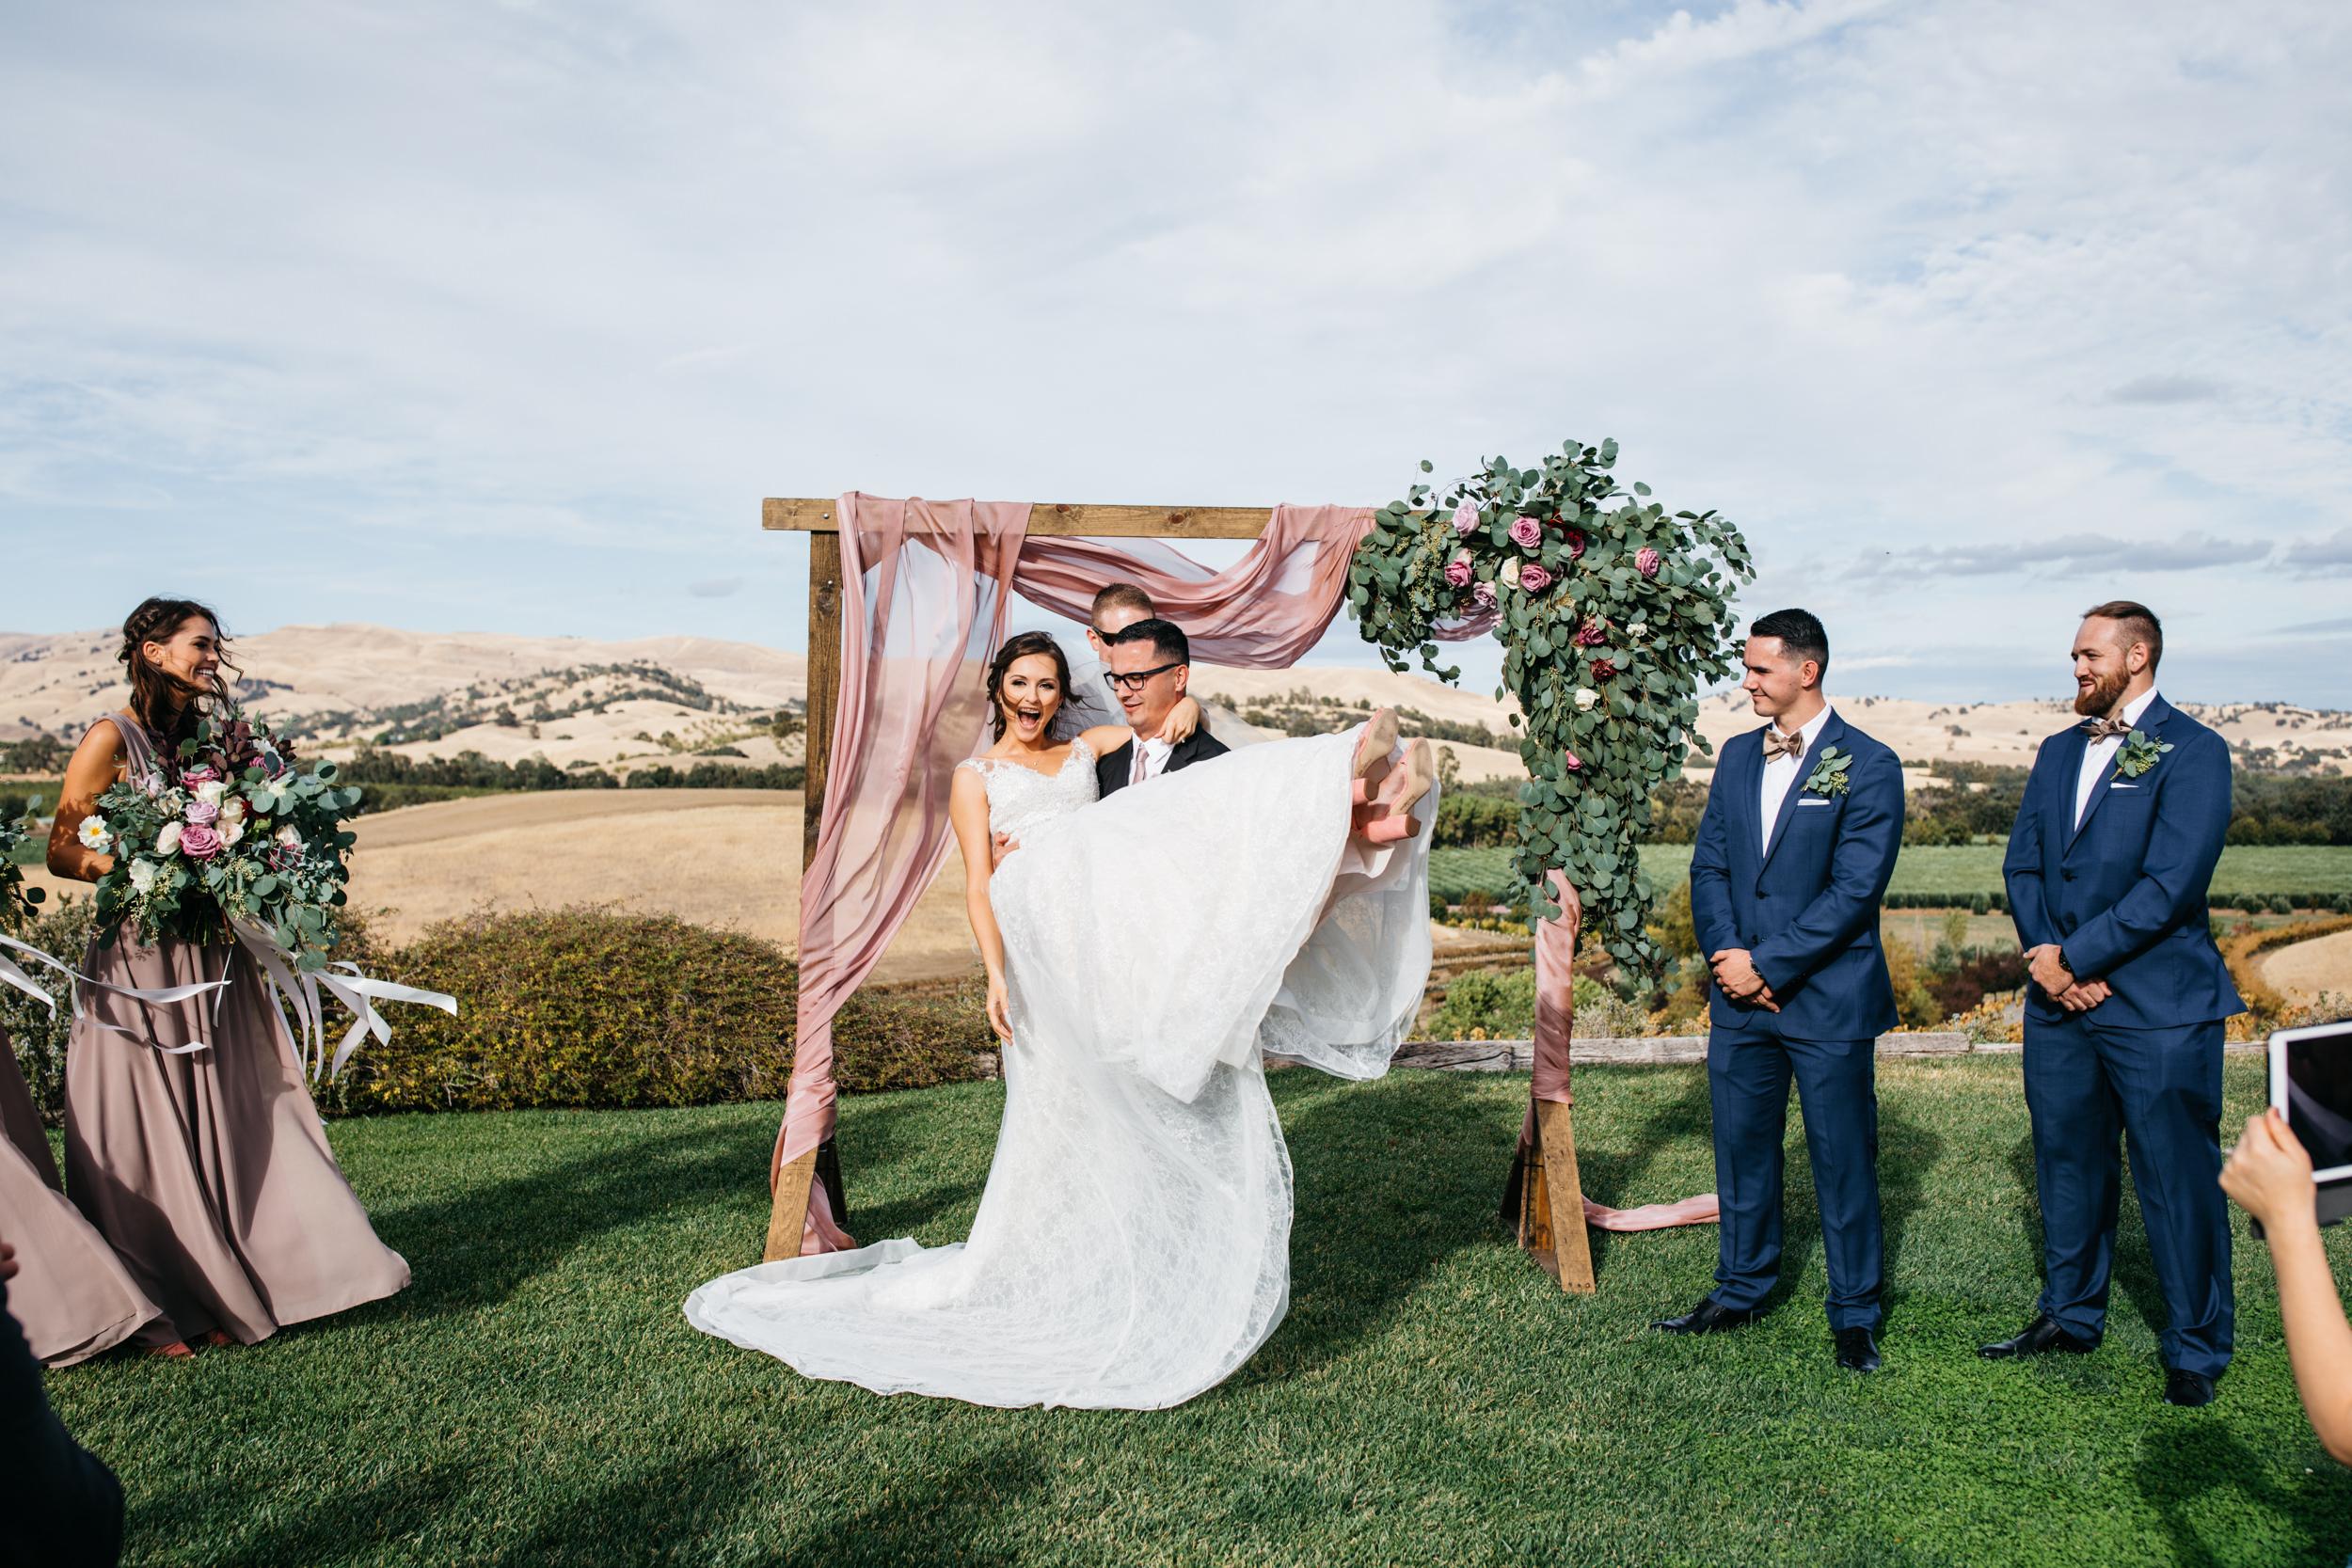 Nazariy_Tanya_Wedding-69.jpg